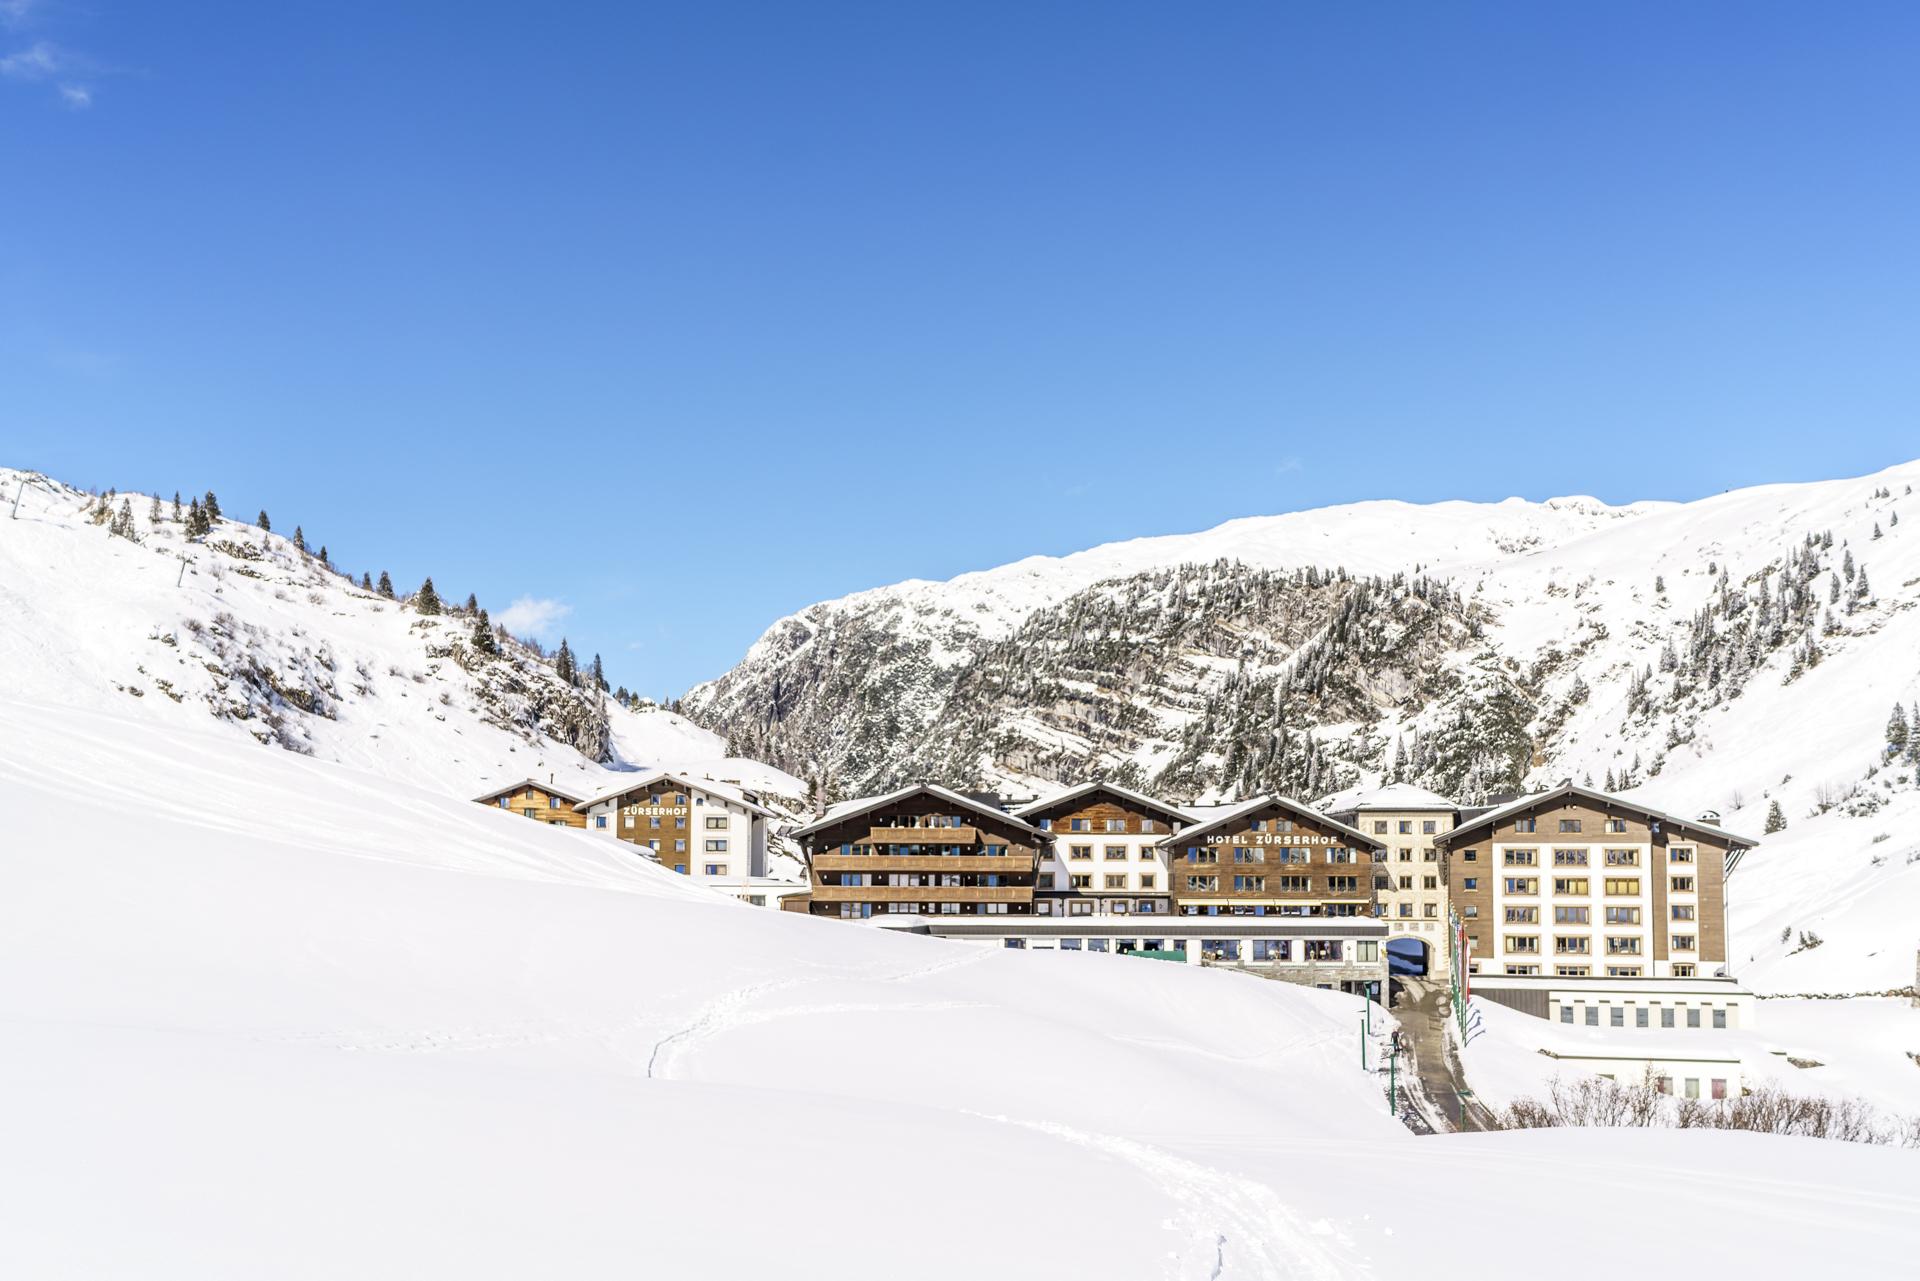 Hotel Zürserhof am Arlberg